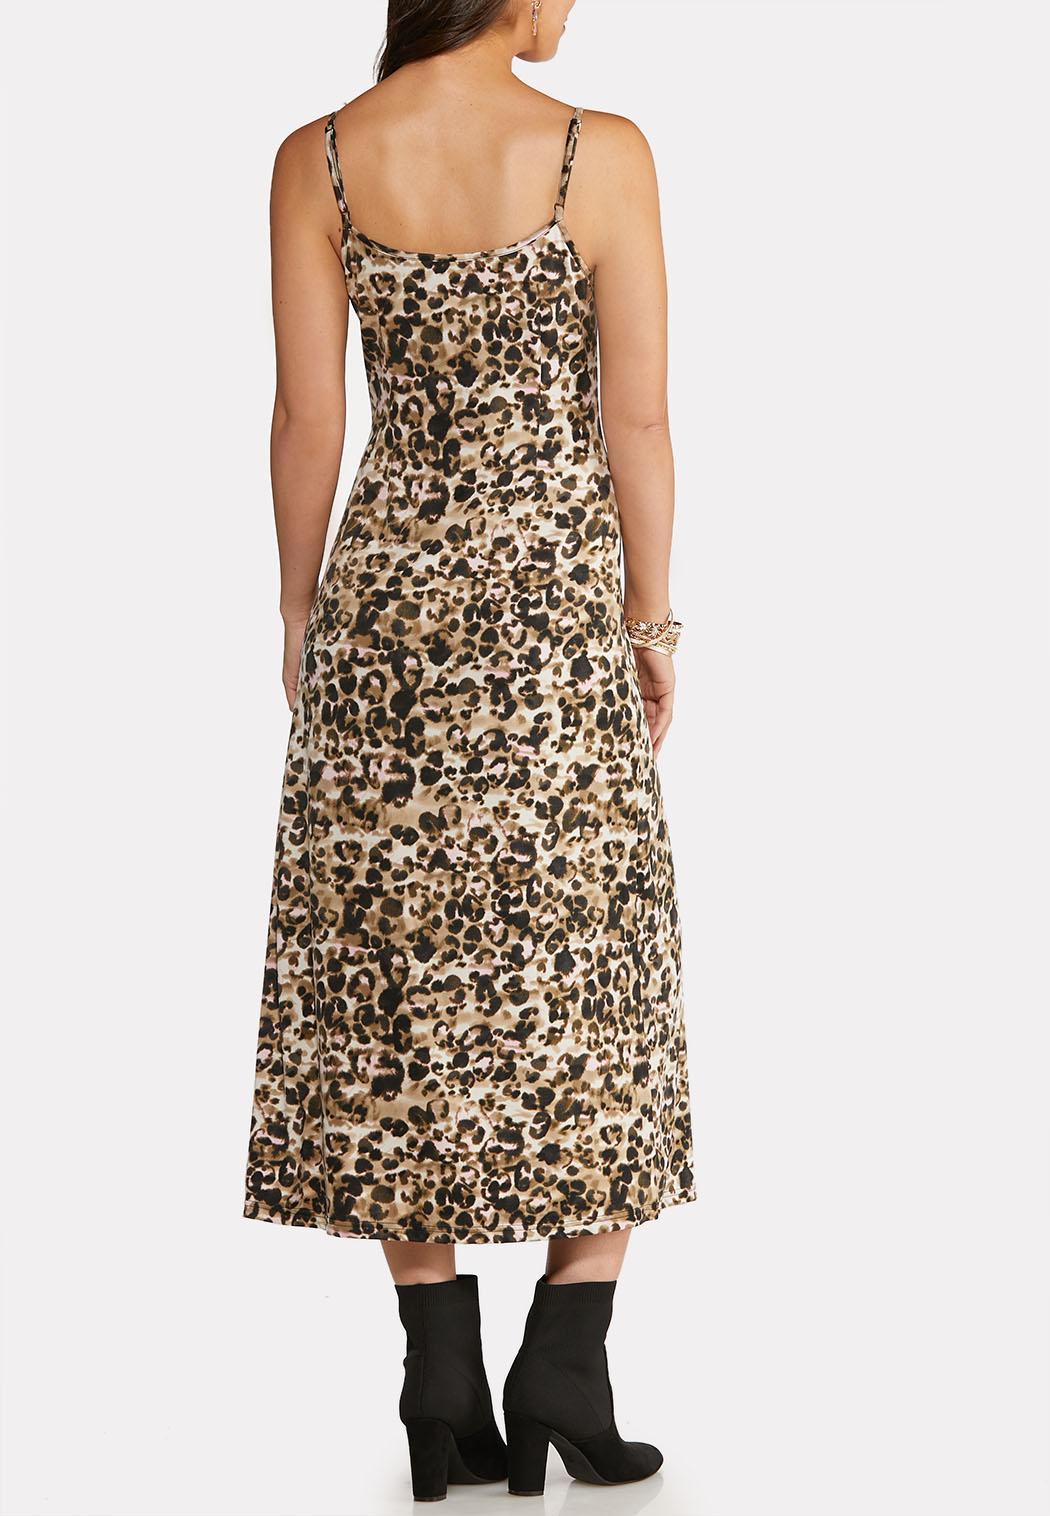 Leopard Slip and Sweater Dress Set (Item #44084427)